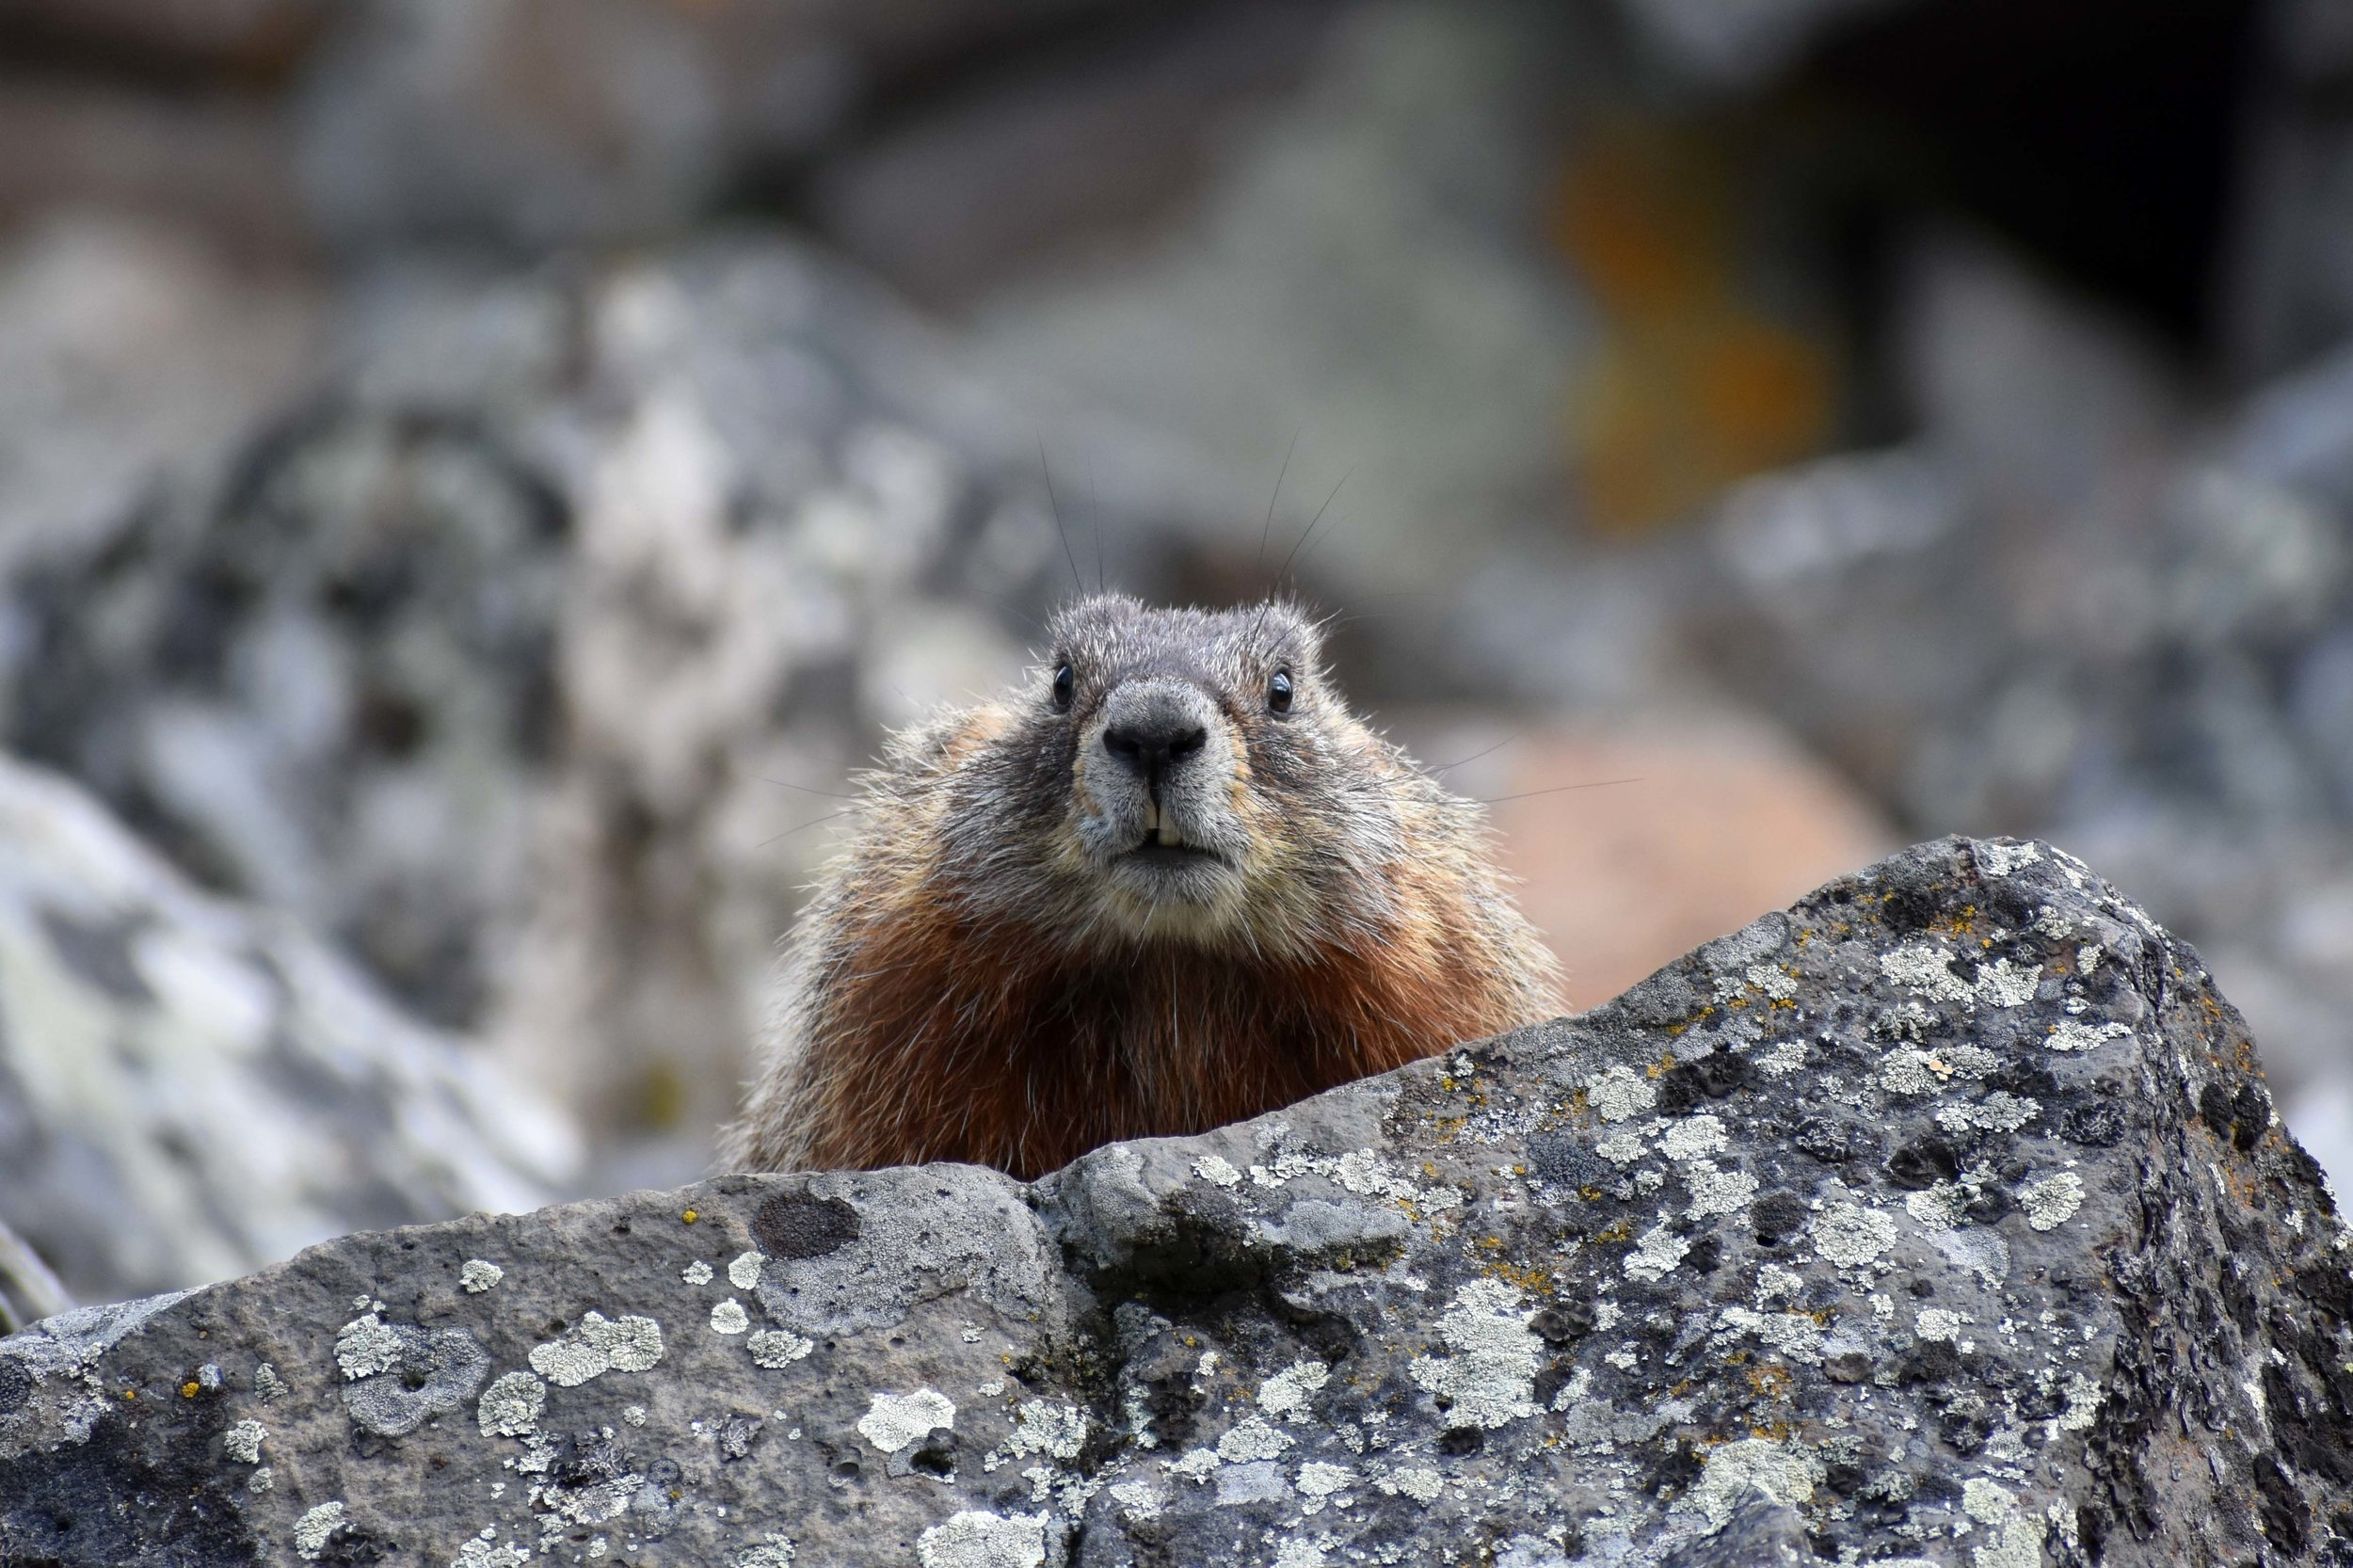 Marmot, Sheepeater Cliffs, Yellowstone NP            Copyright © Marlo Garnsworthy 2017